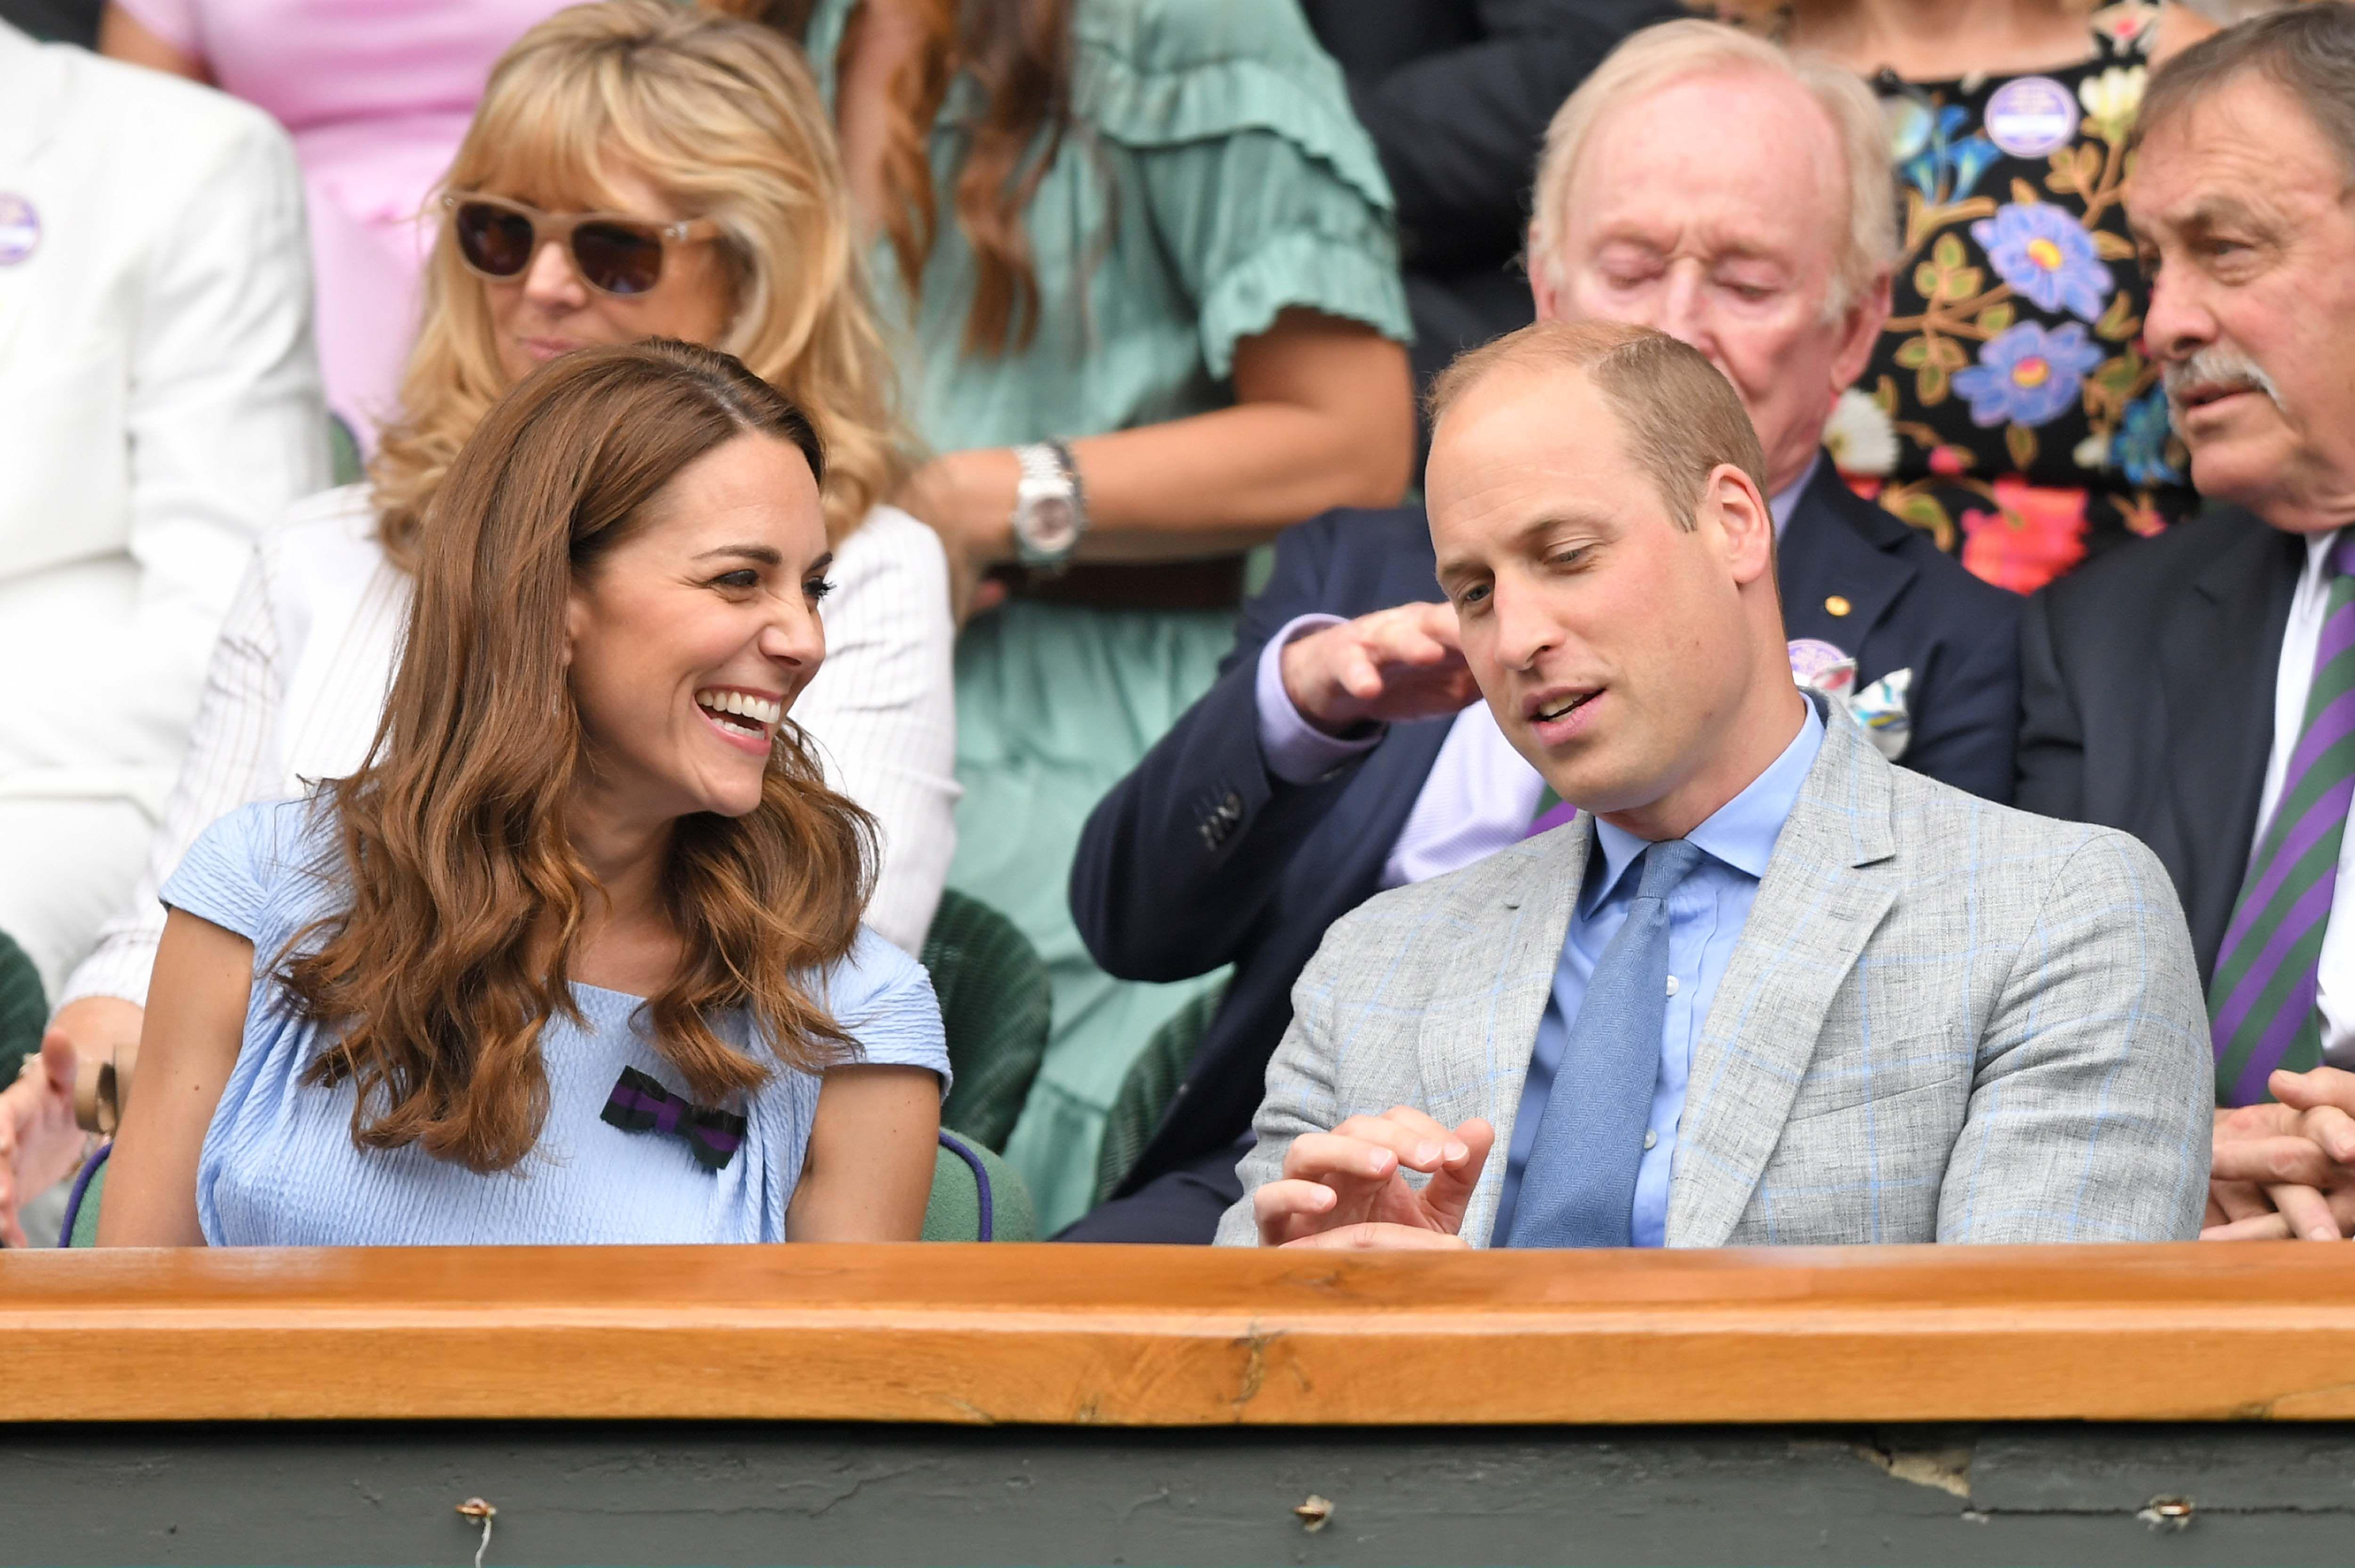 Kate Middleton Wears Custom Blue Emilia Wickstead Dress to Wimbledon with Prince William